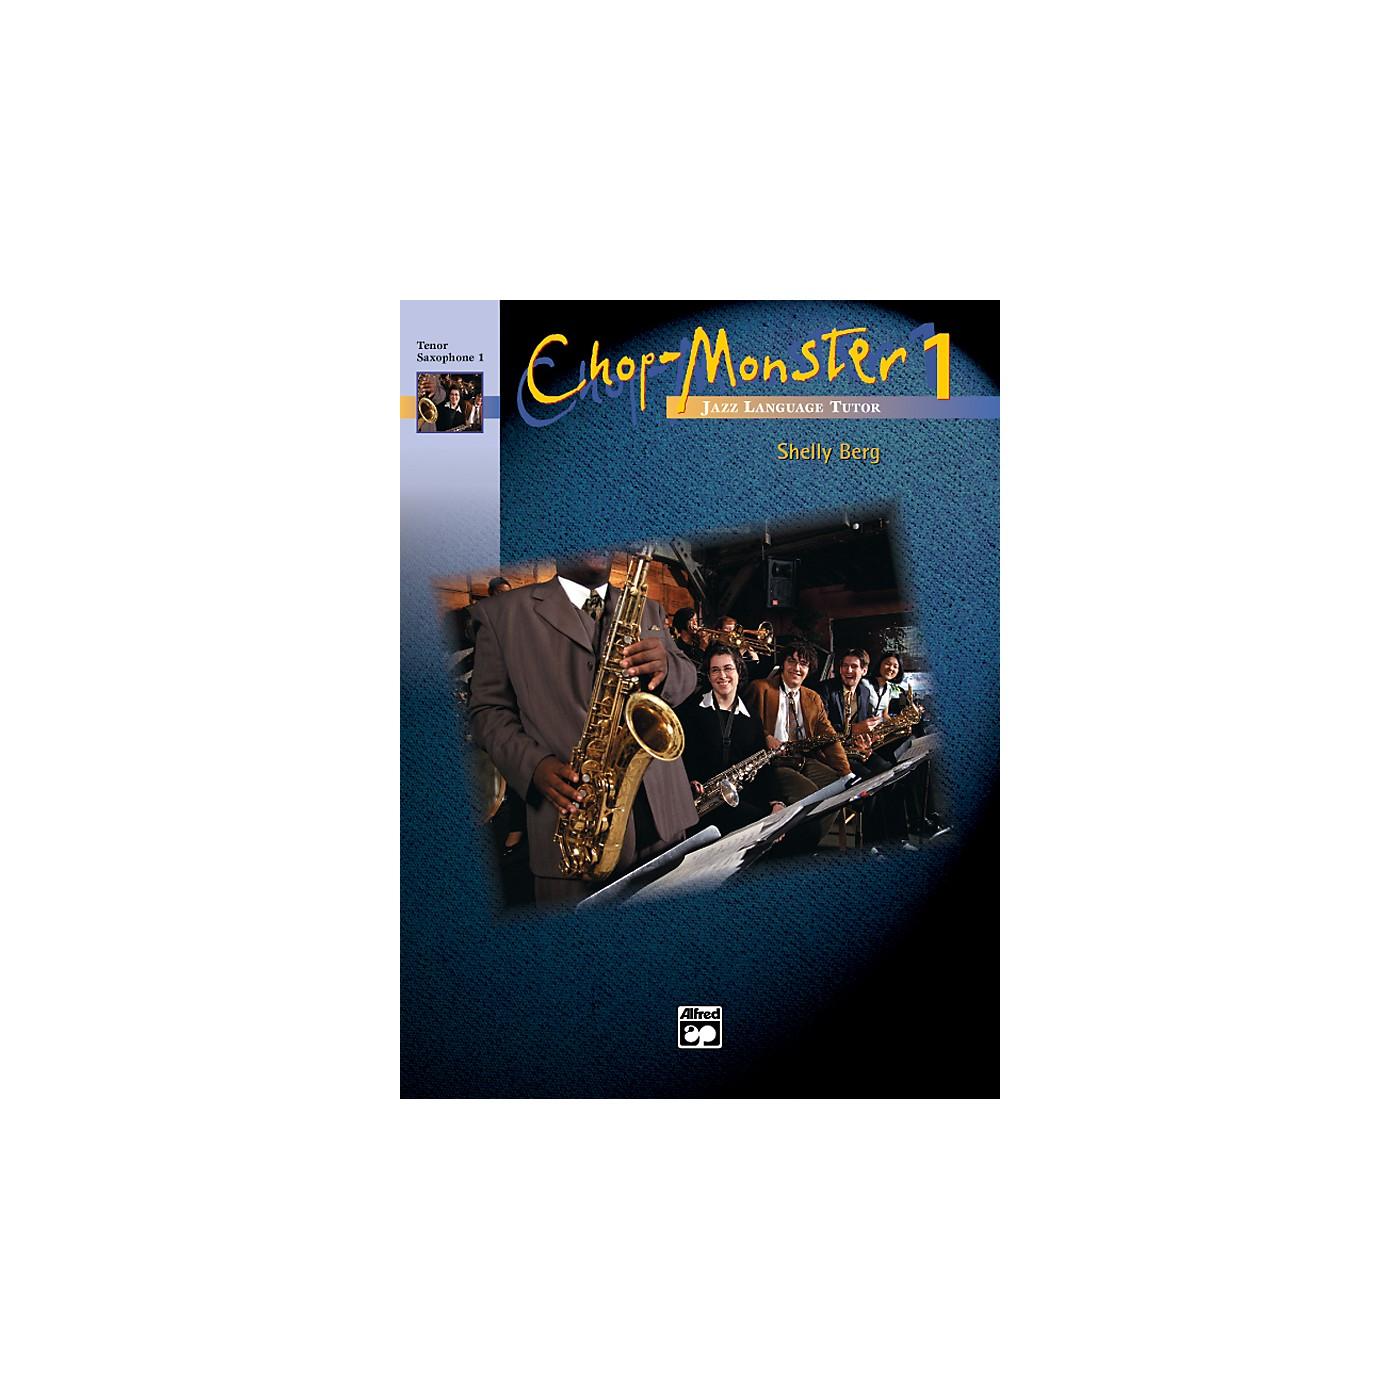 Alfred Chop-Monster Book 1 Trombone 4 Book thumbnail